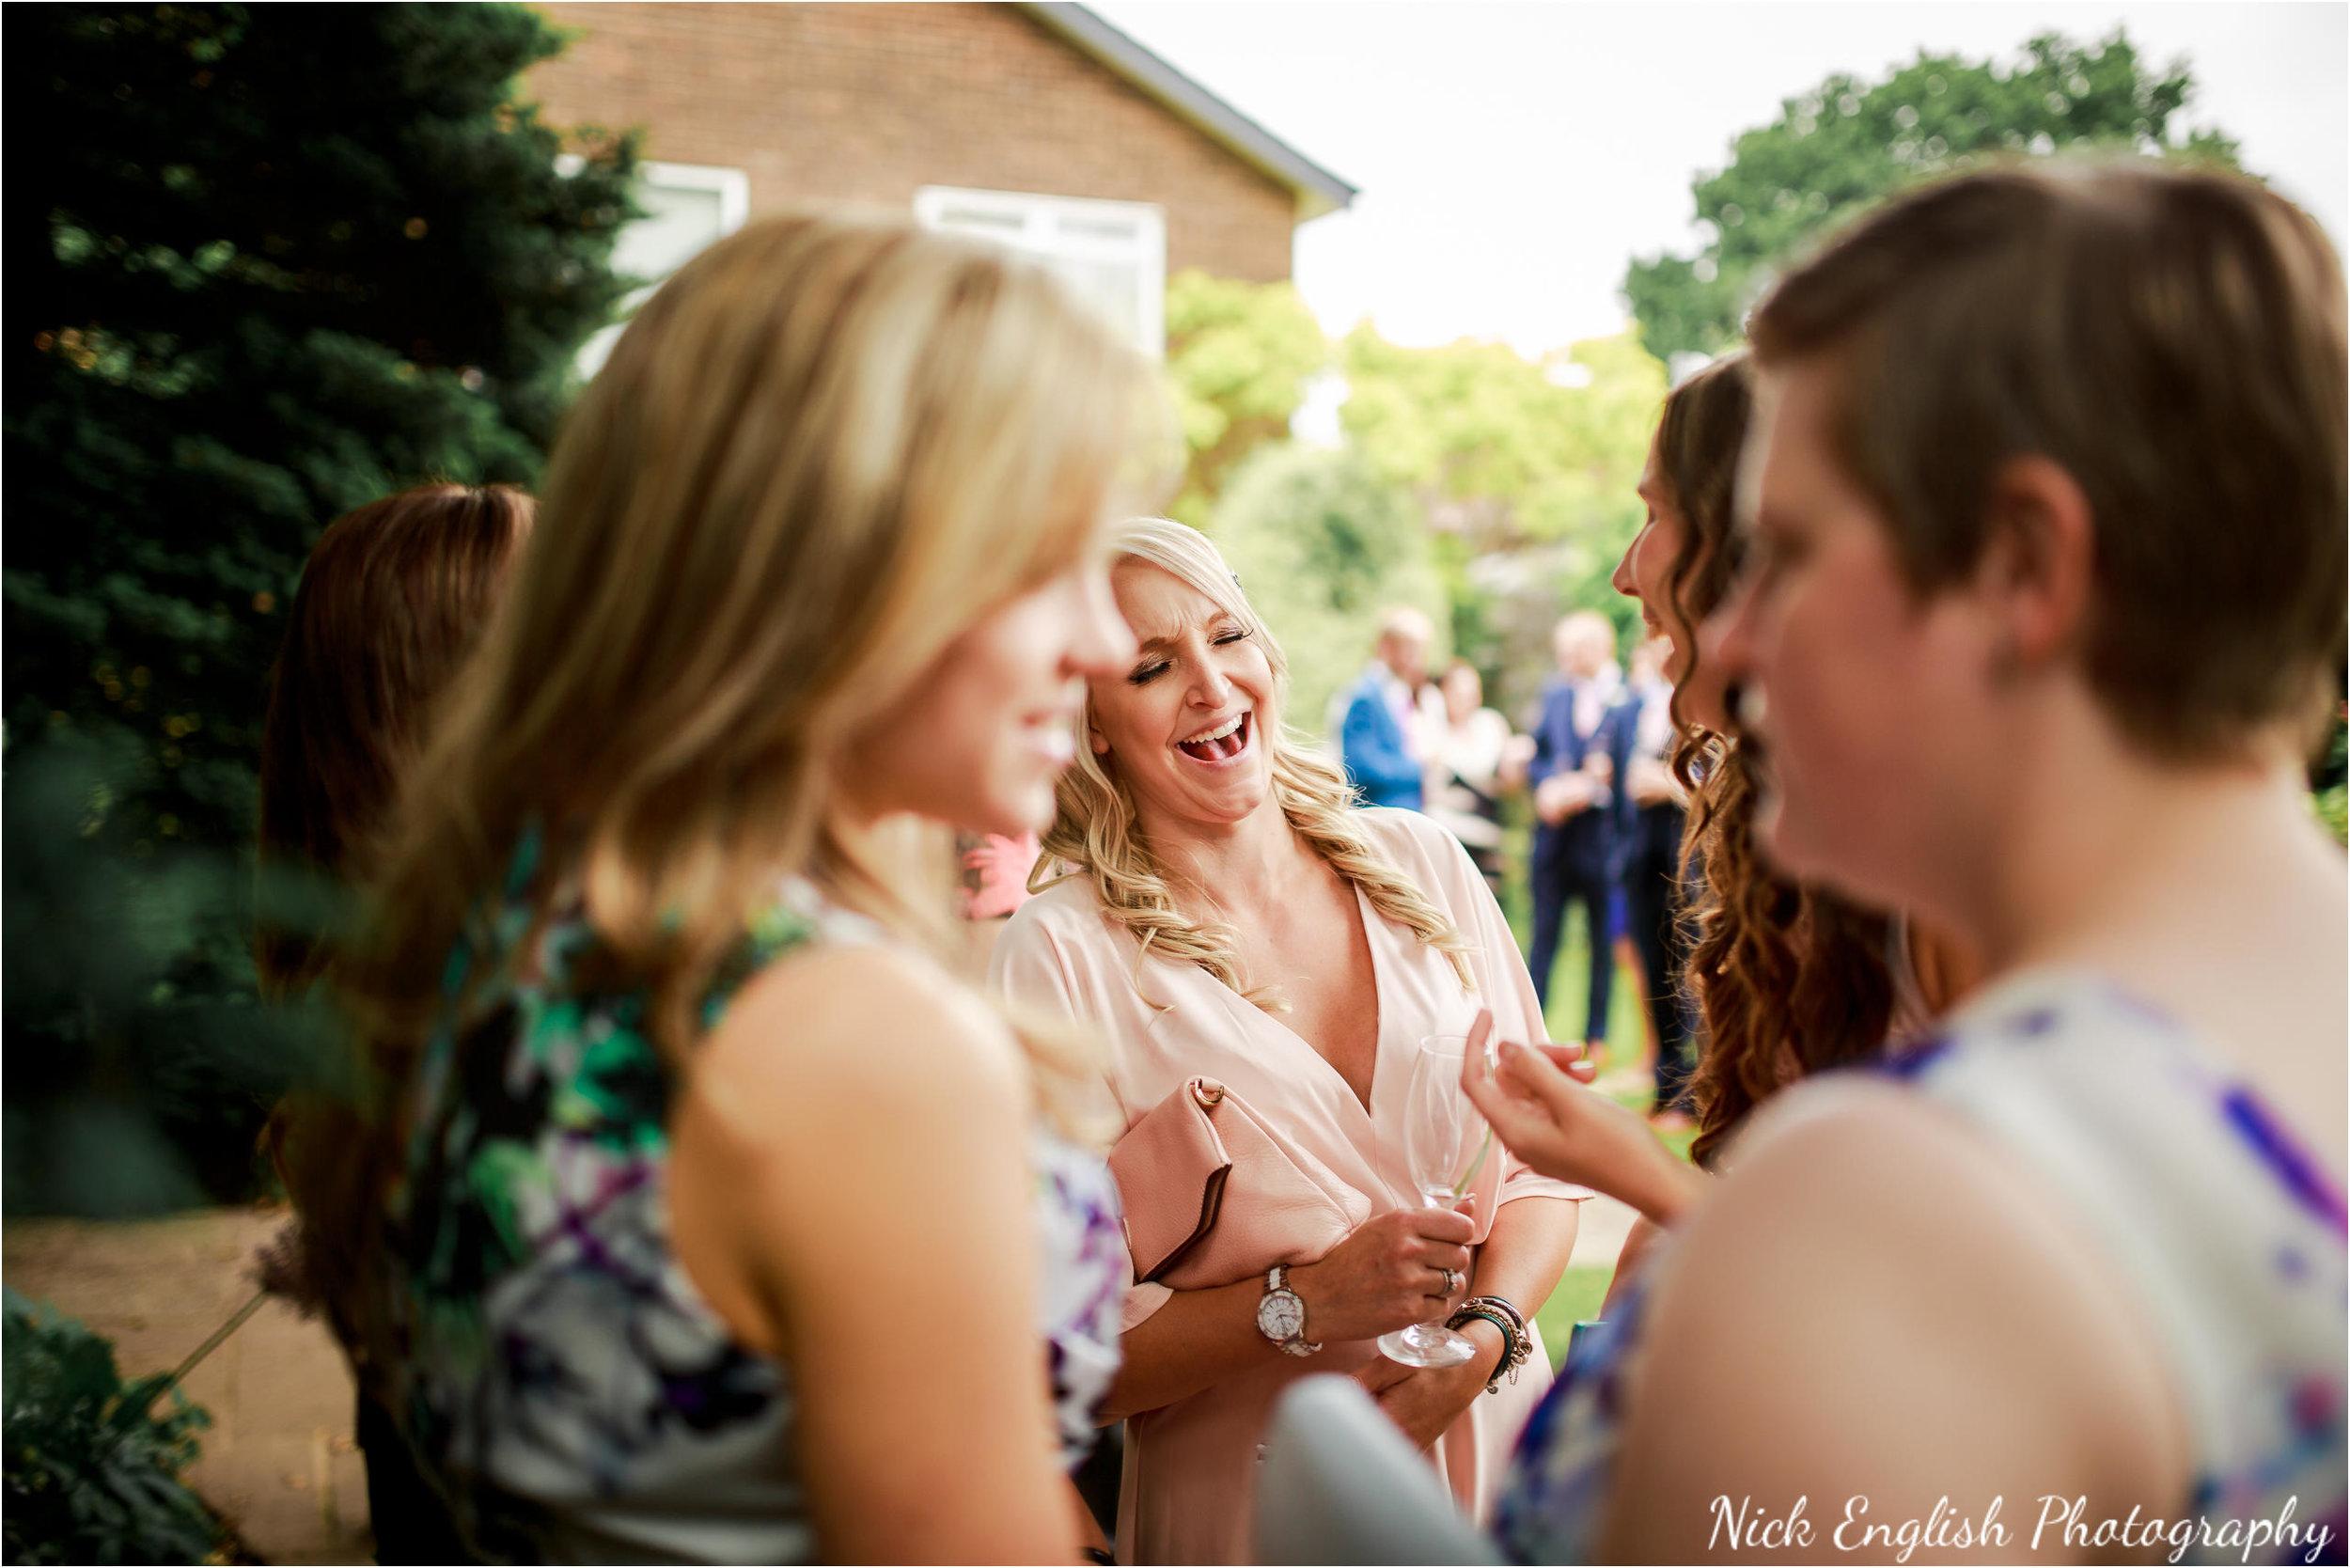 Emily David Wedding Photographs at Barton Grange Preston by Nick English Photography 137jpg.jpeg